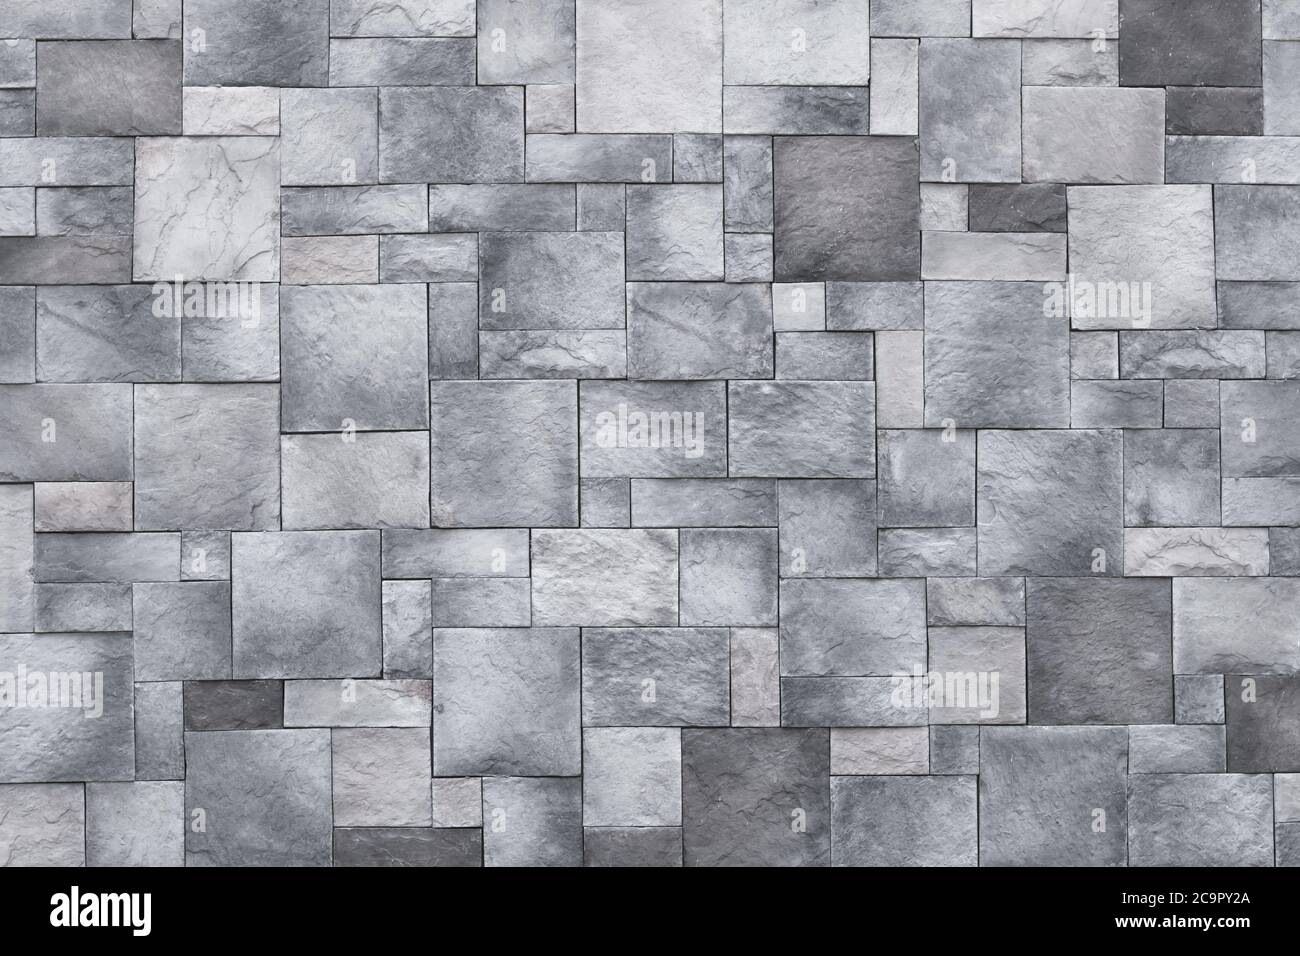 Squares background, stone wall texture, gray rock floor. Monochrome granite, brick surface. Architectural design concept Stock Photo